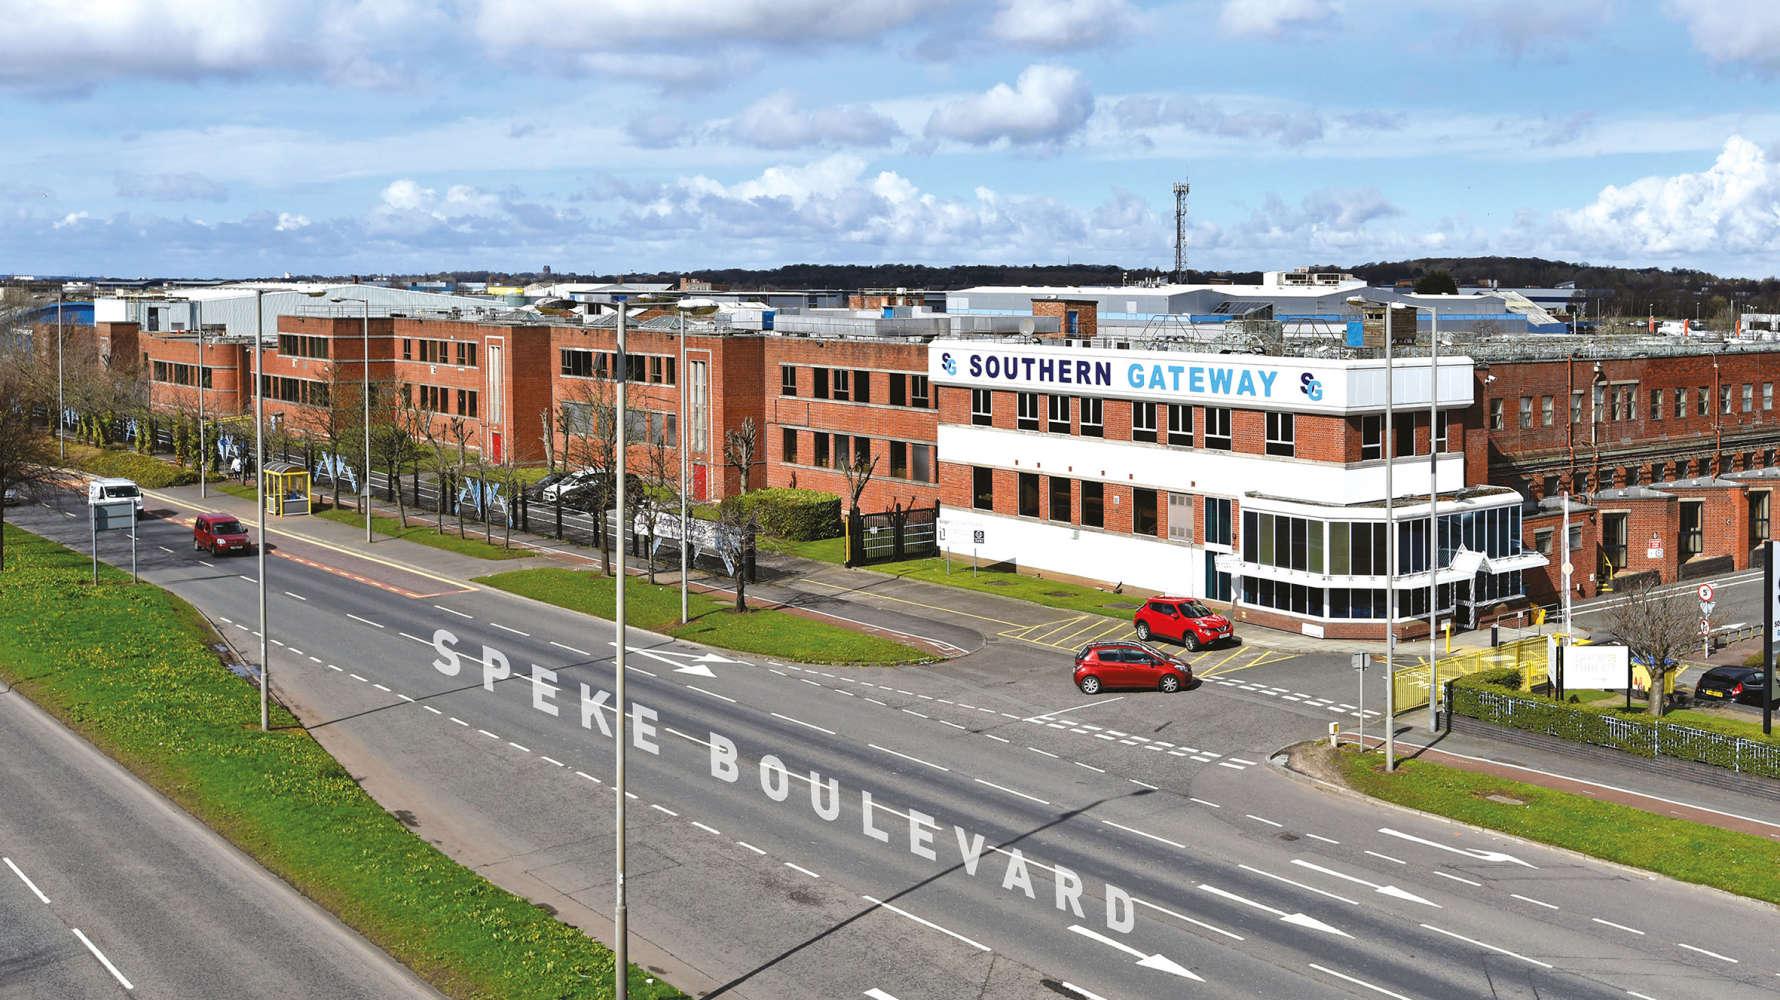 Industrial Liverpool, L24 9HZ - Units G9, G10 & G11, Southern Gateway - 37271